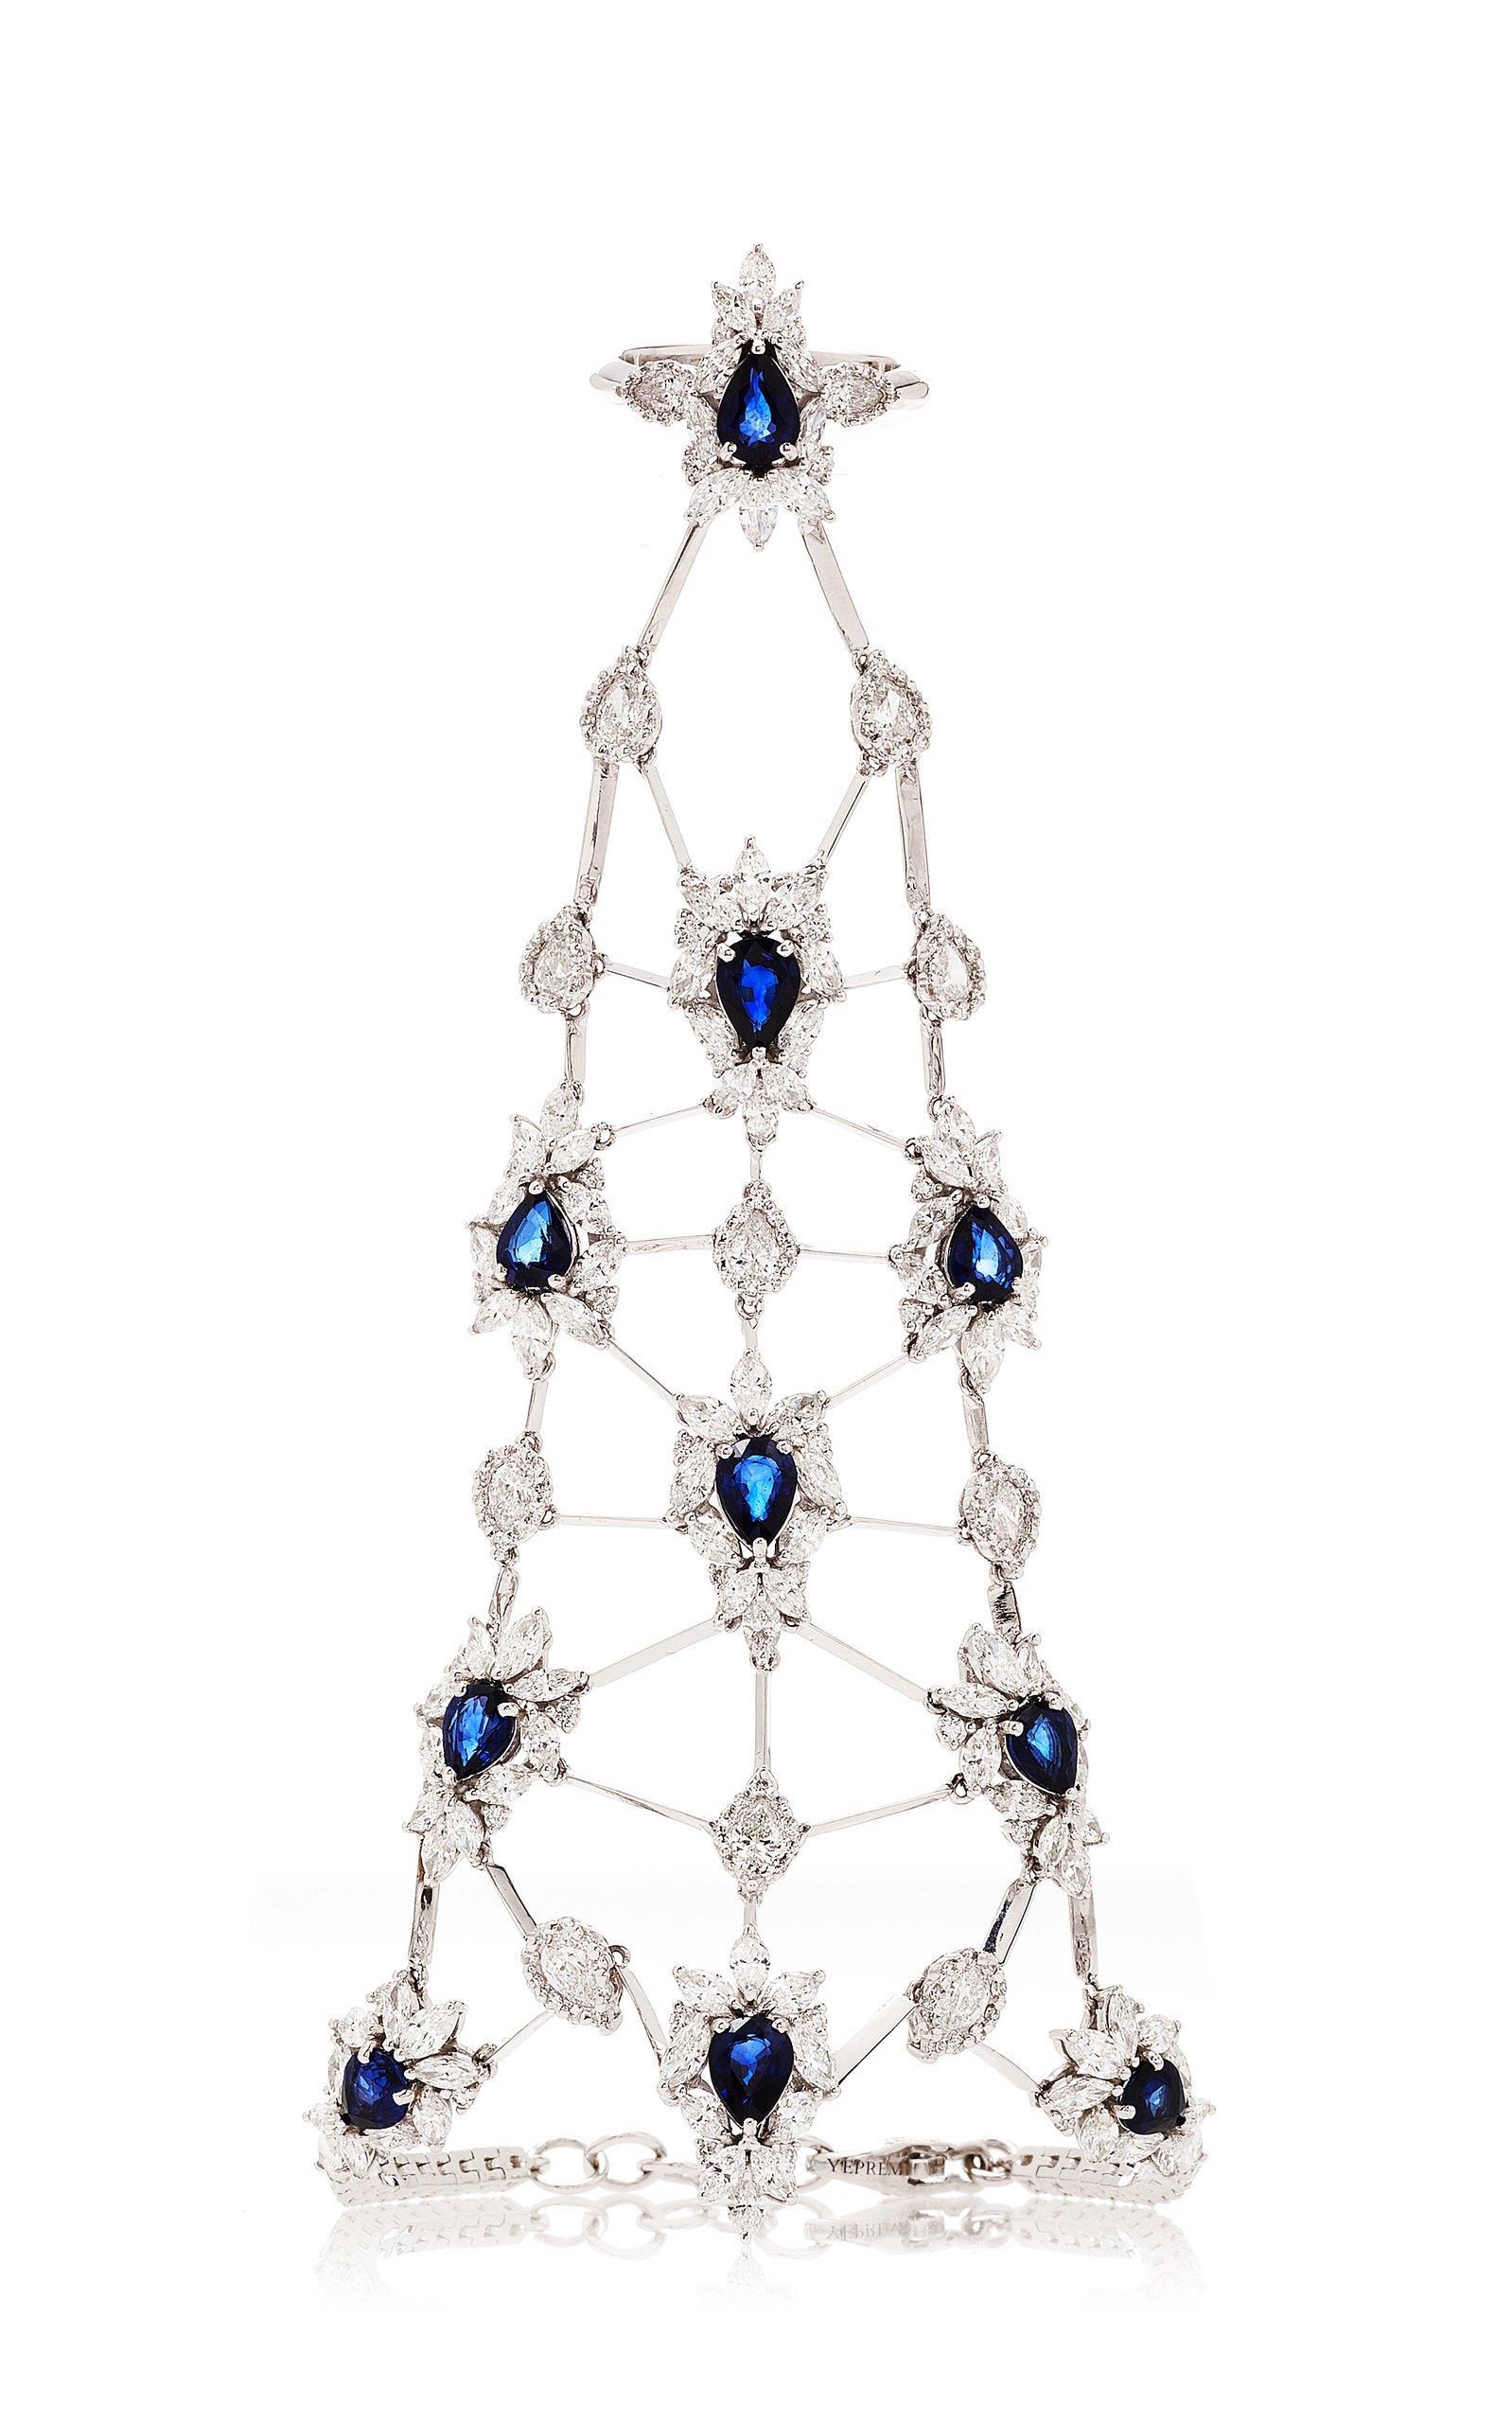 Diamond And Sapphire Ring And Bracelet Chain by Yeprem | Moda Operandi